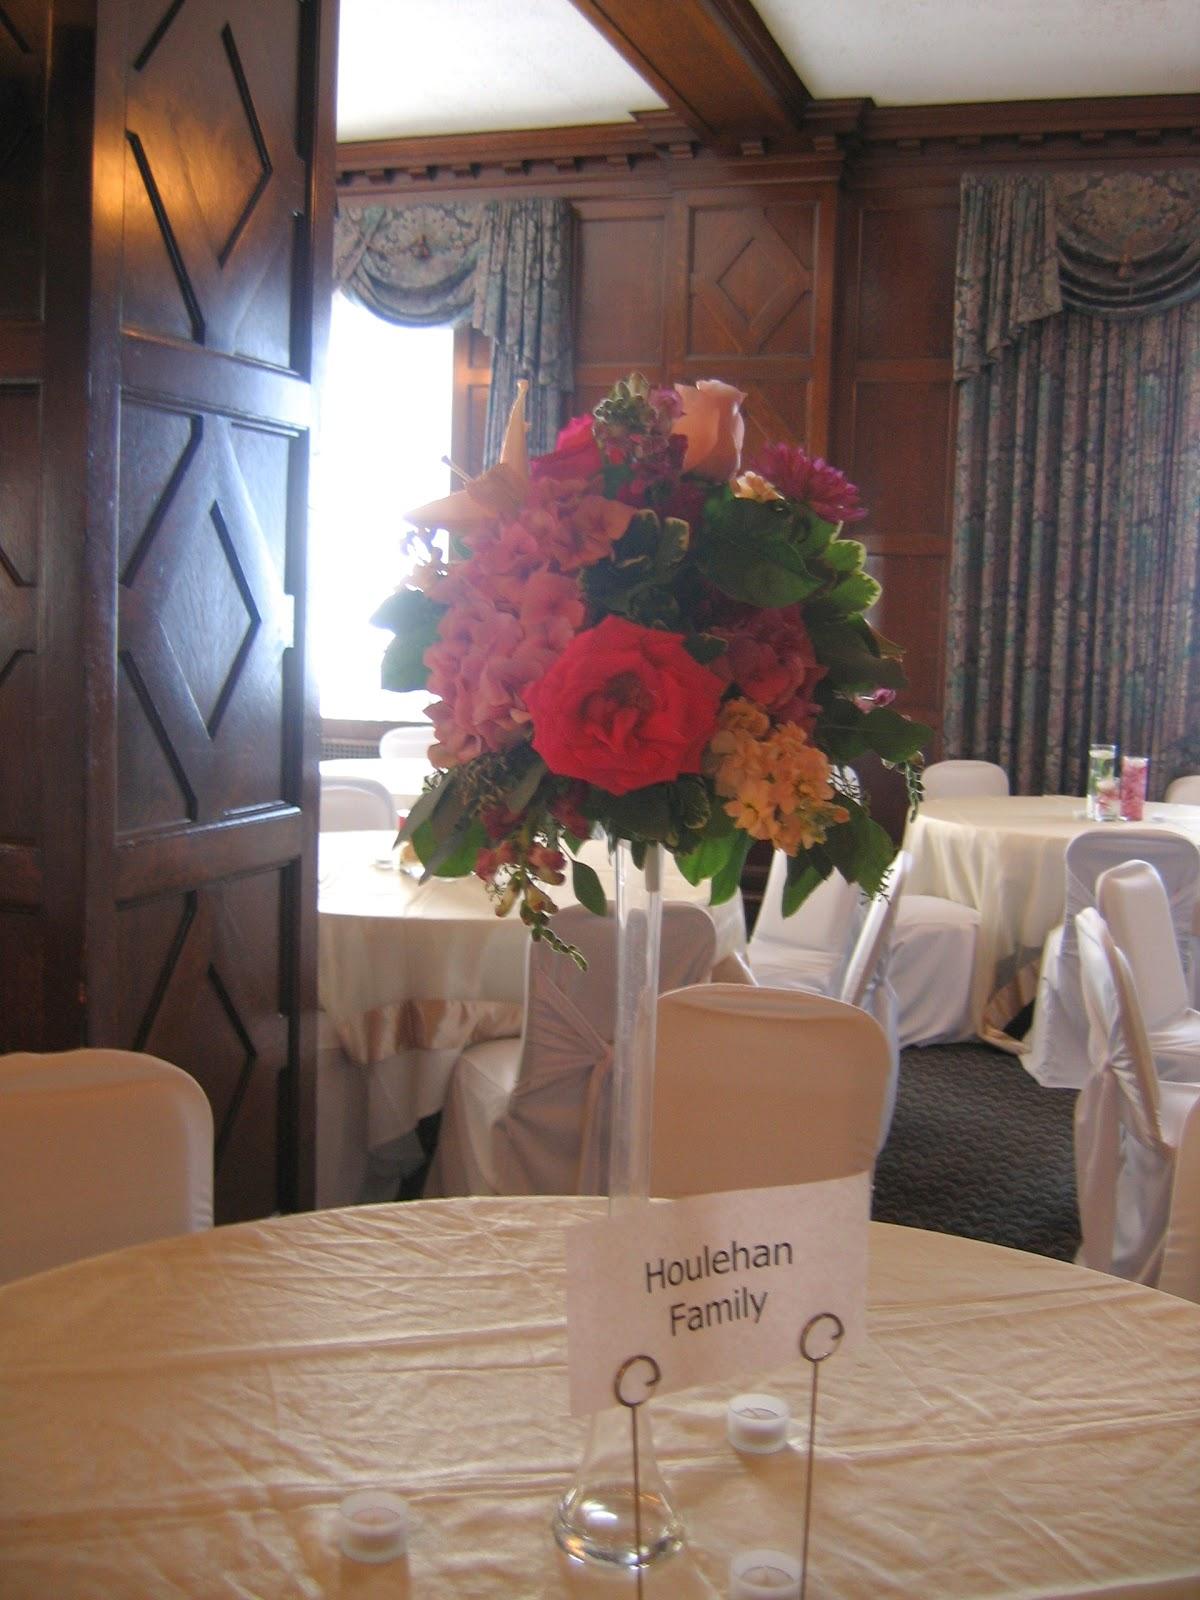 Wedding centerpiece ideas tall vase vases on tall wedding glass tall vase wedding centerpieces car tuning reviewsmspy